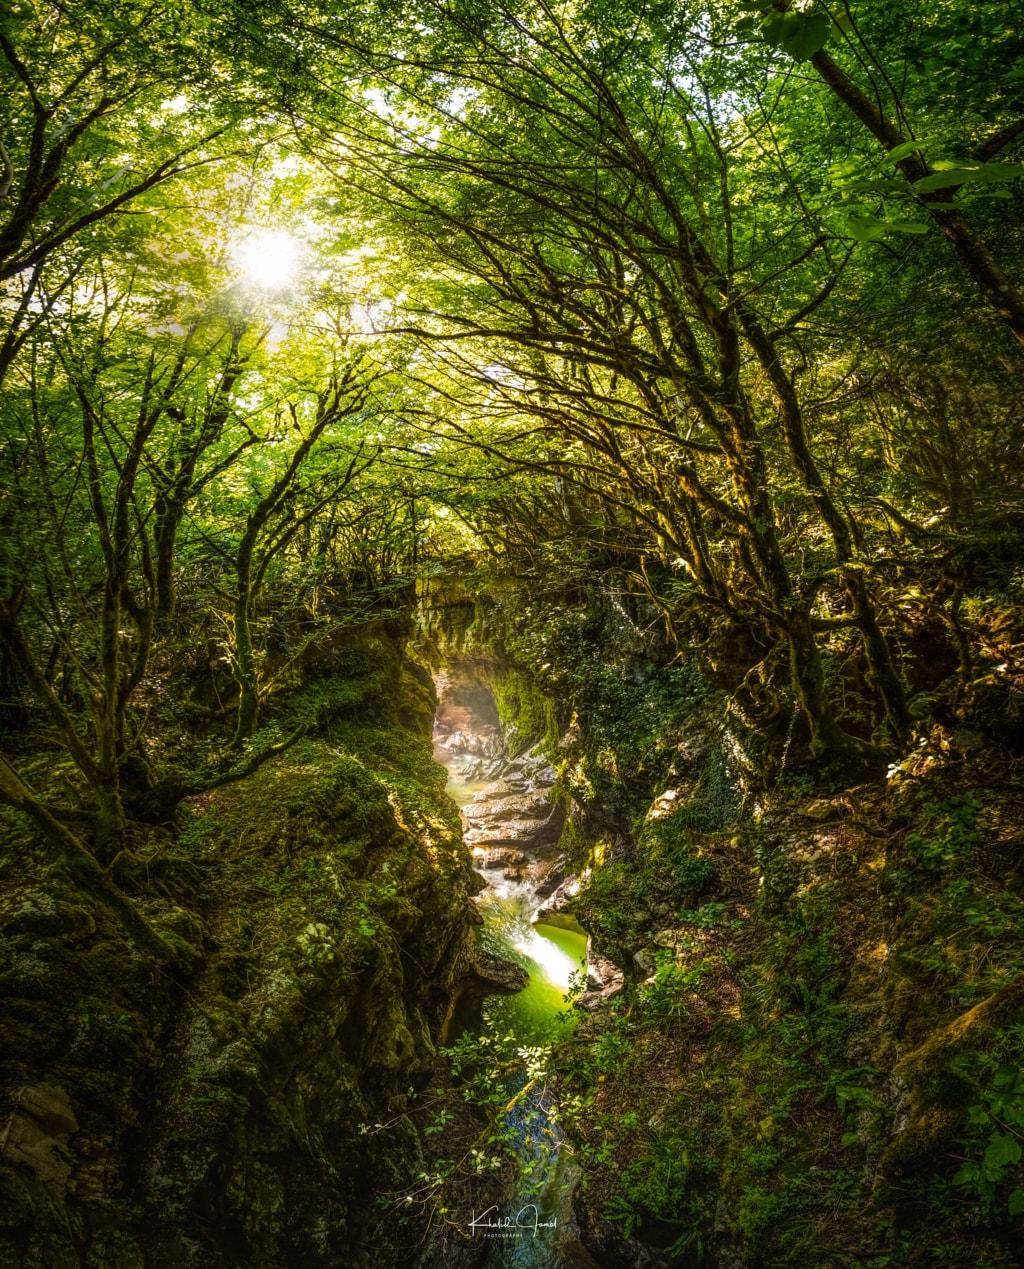 Through the forest via Khalid Jamal Abdullah